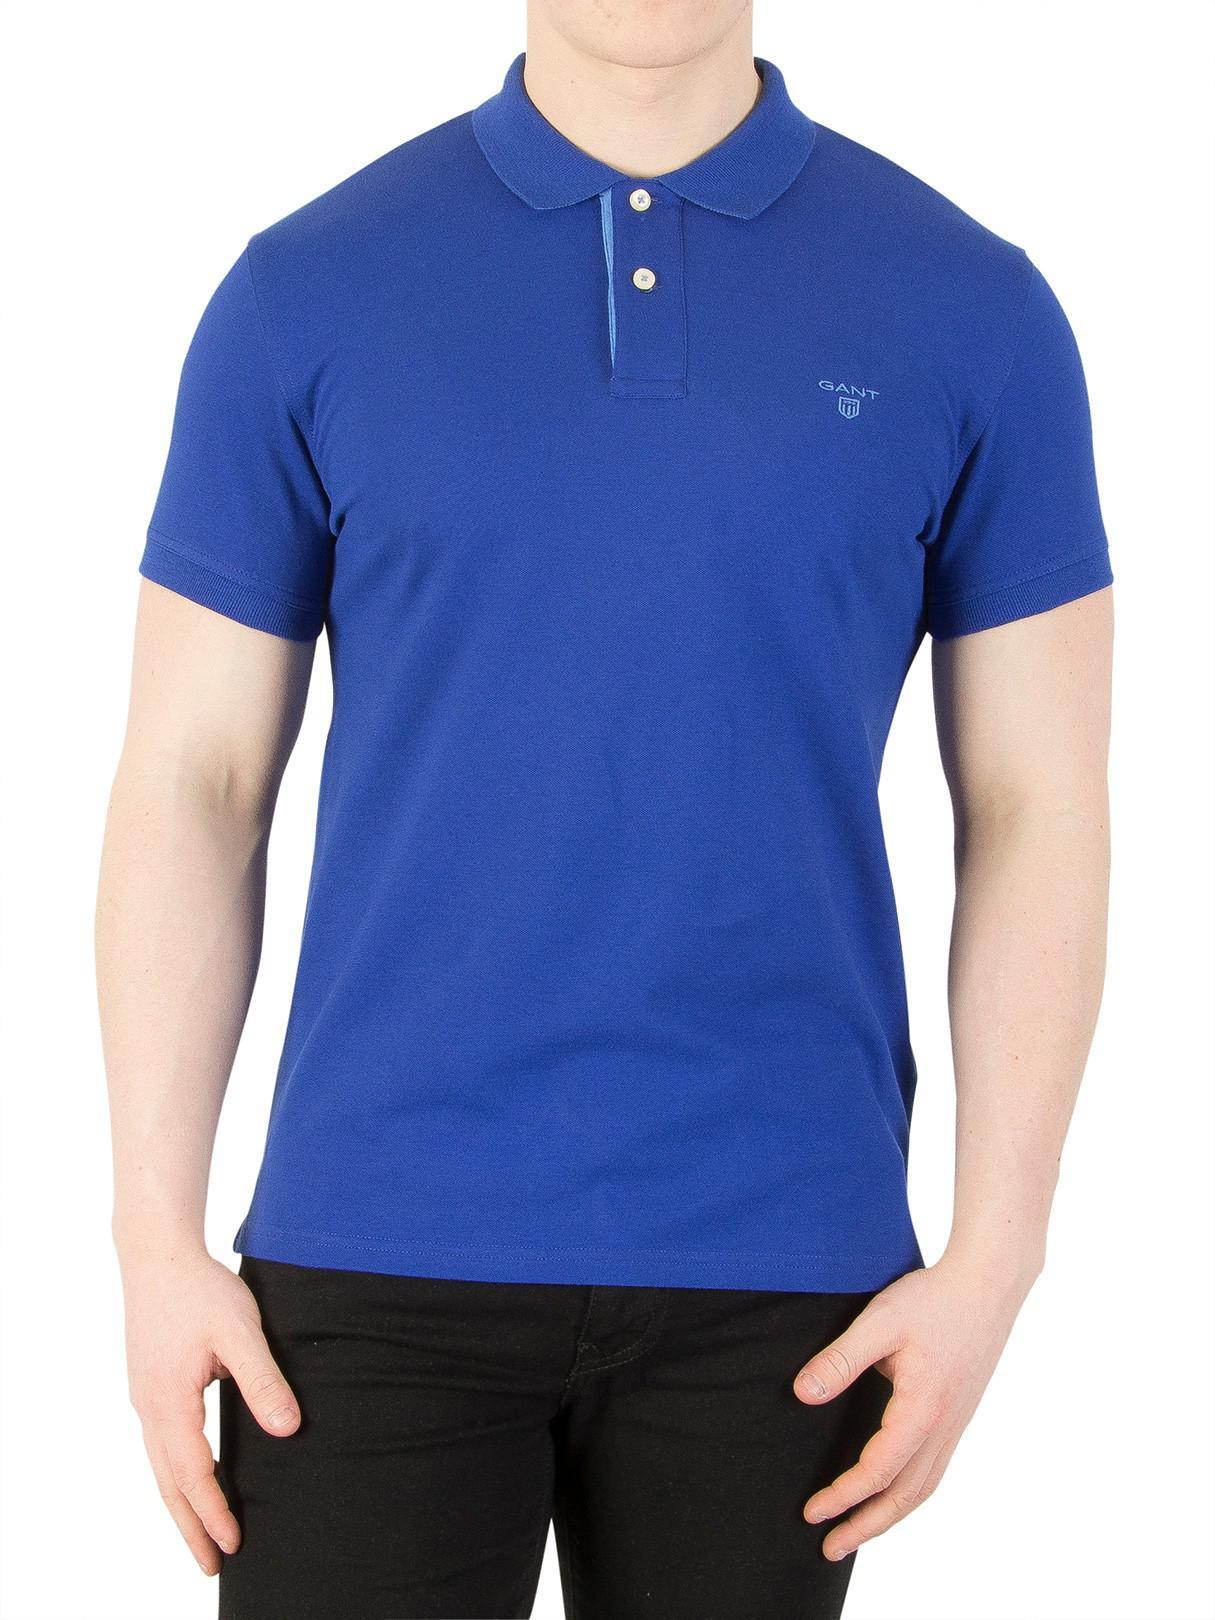 Contrast Shirt Collar Rugger Blue In Logo Yale Gant Pique Polo qSMVzpUG